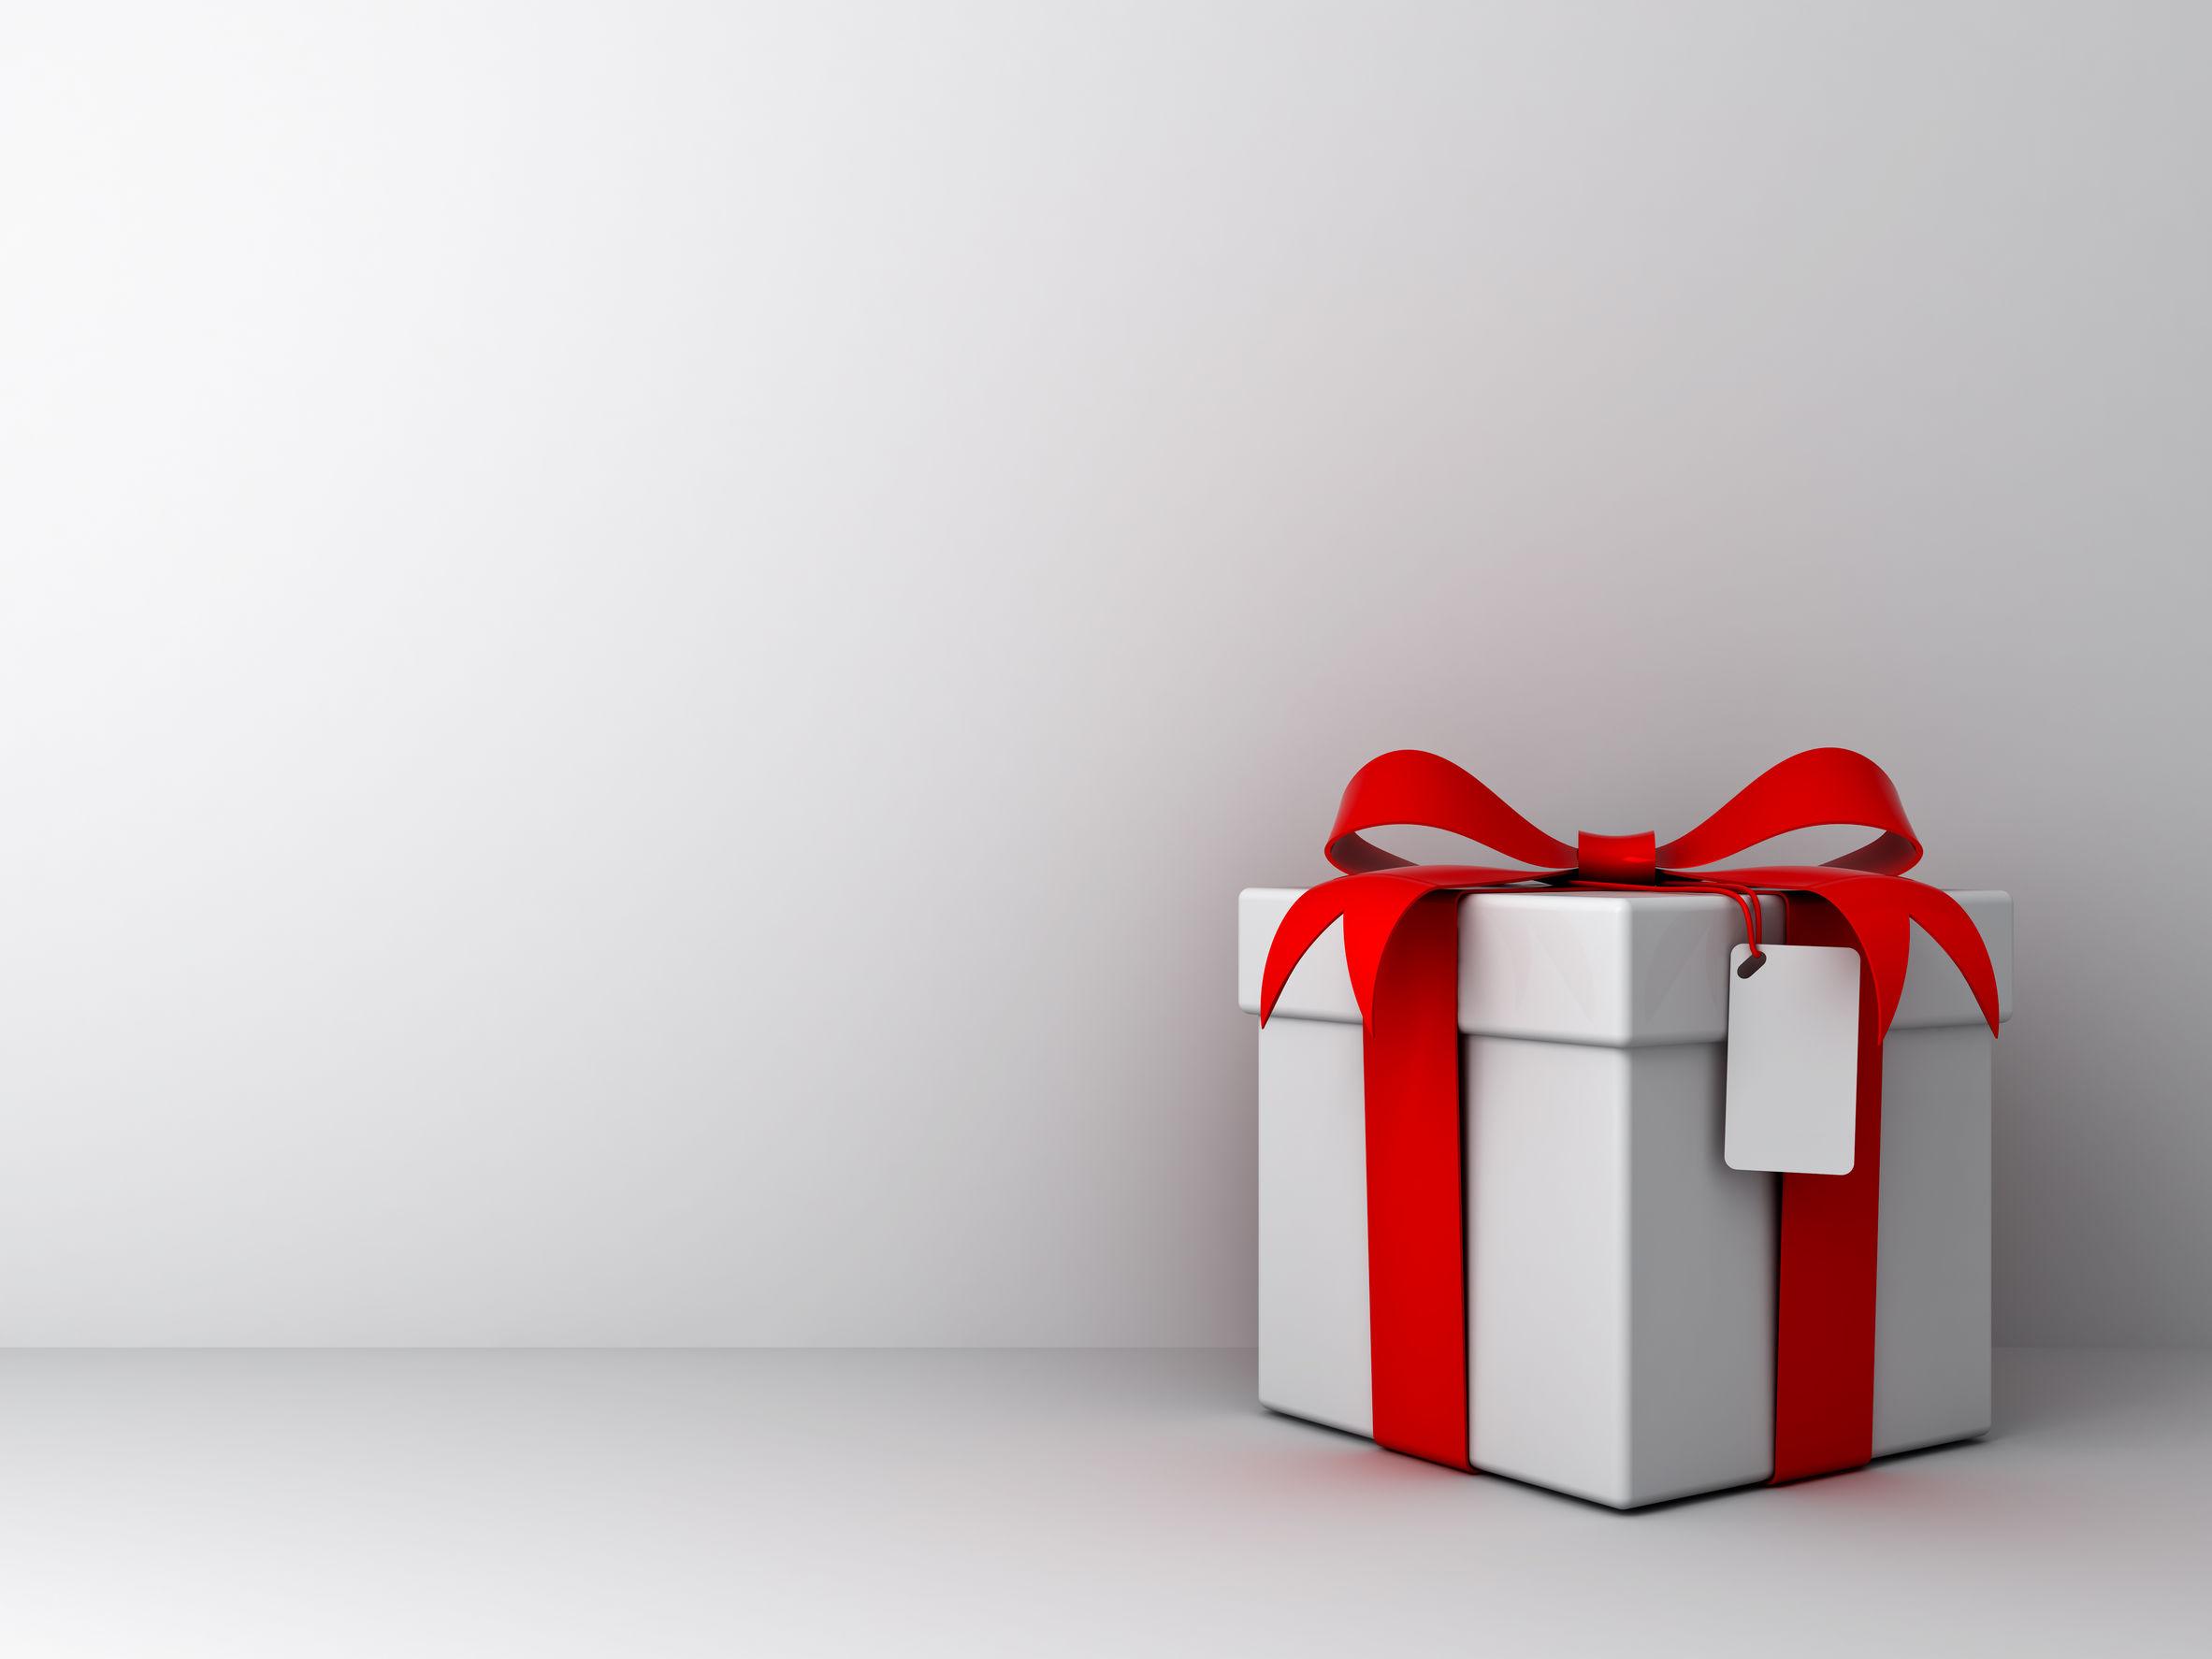 Коробка с подарком 2016